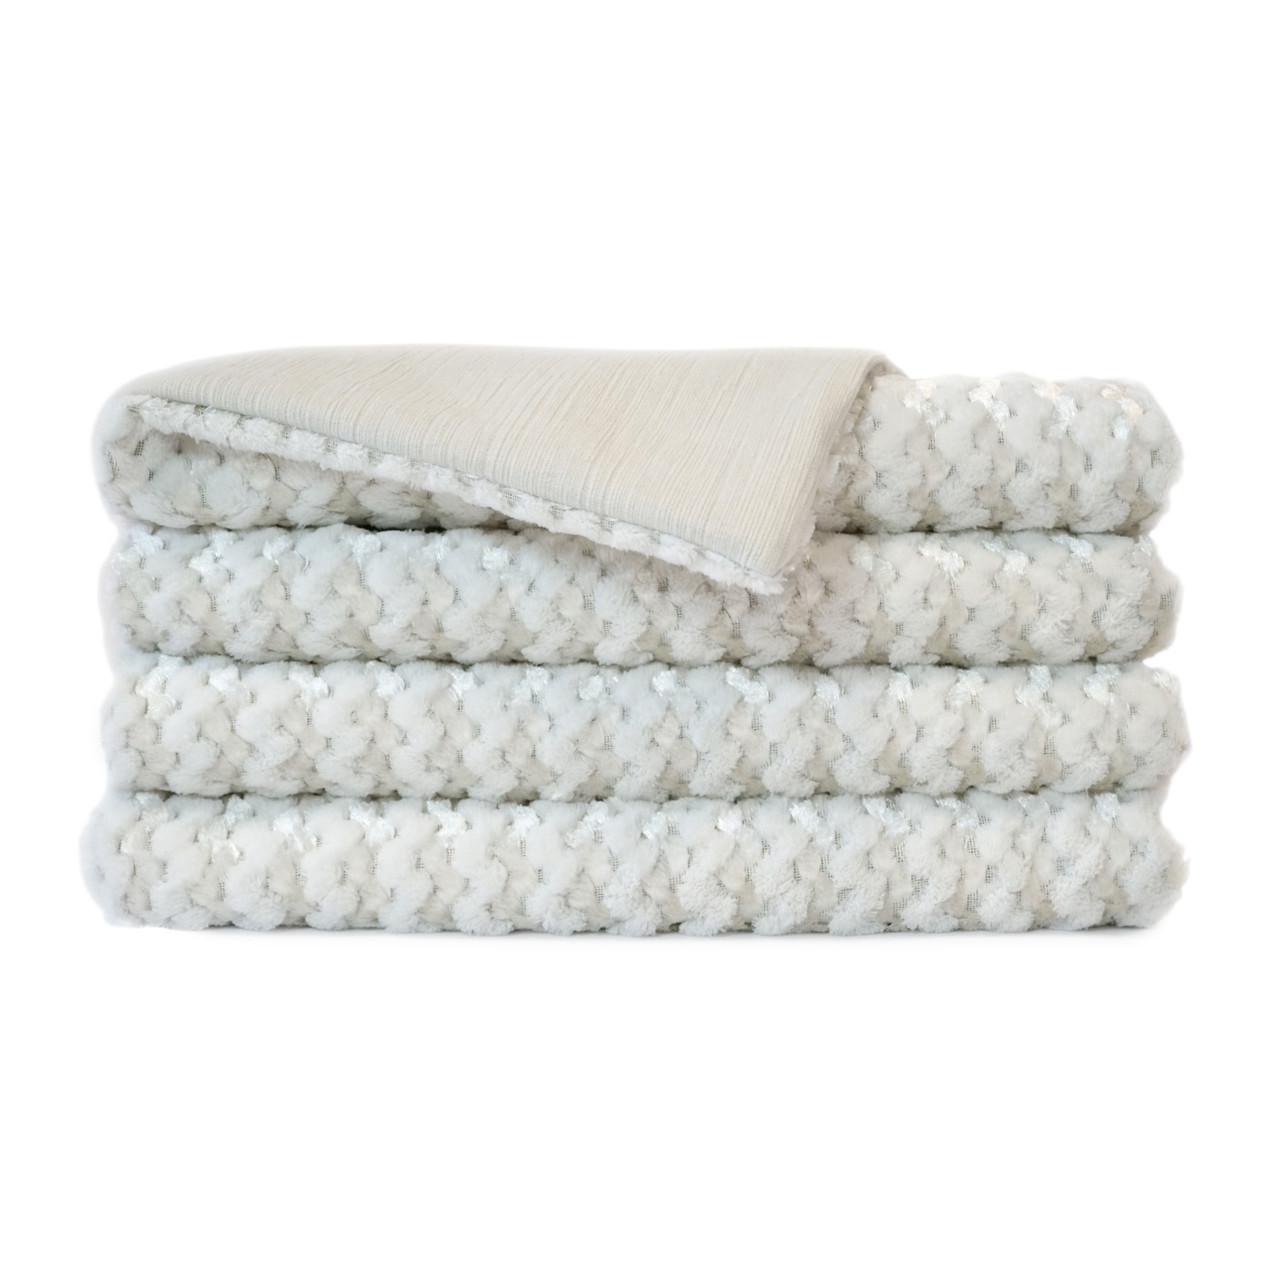 Gene Faux Fur Throw Blanket - Ivory